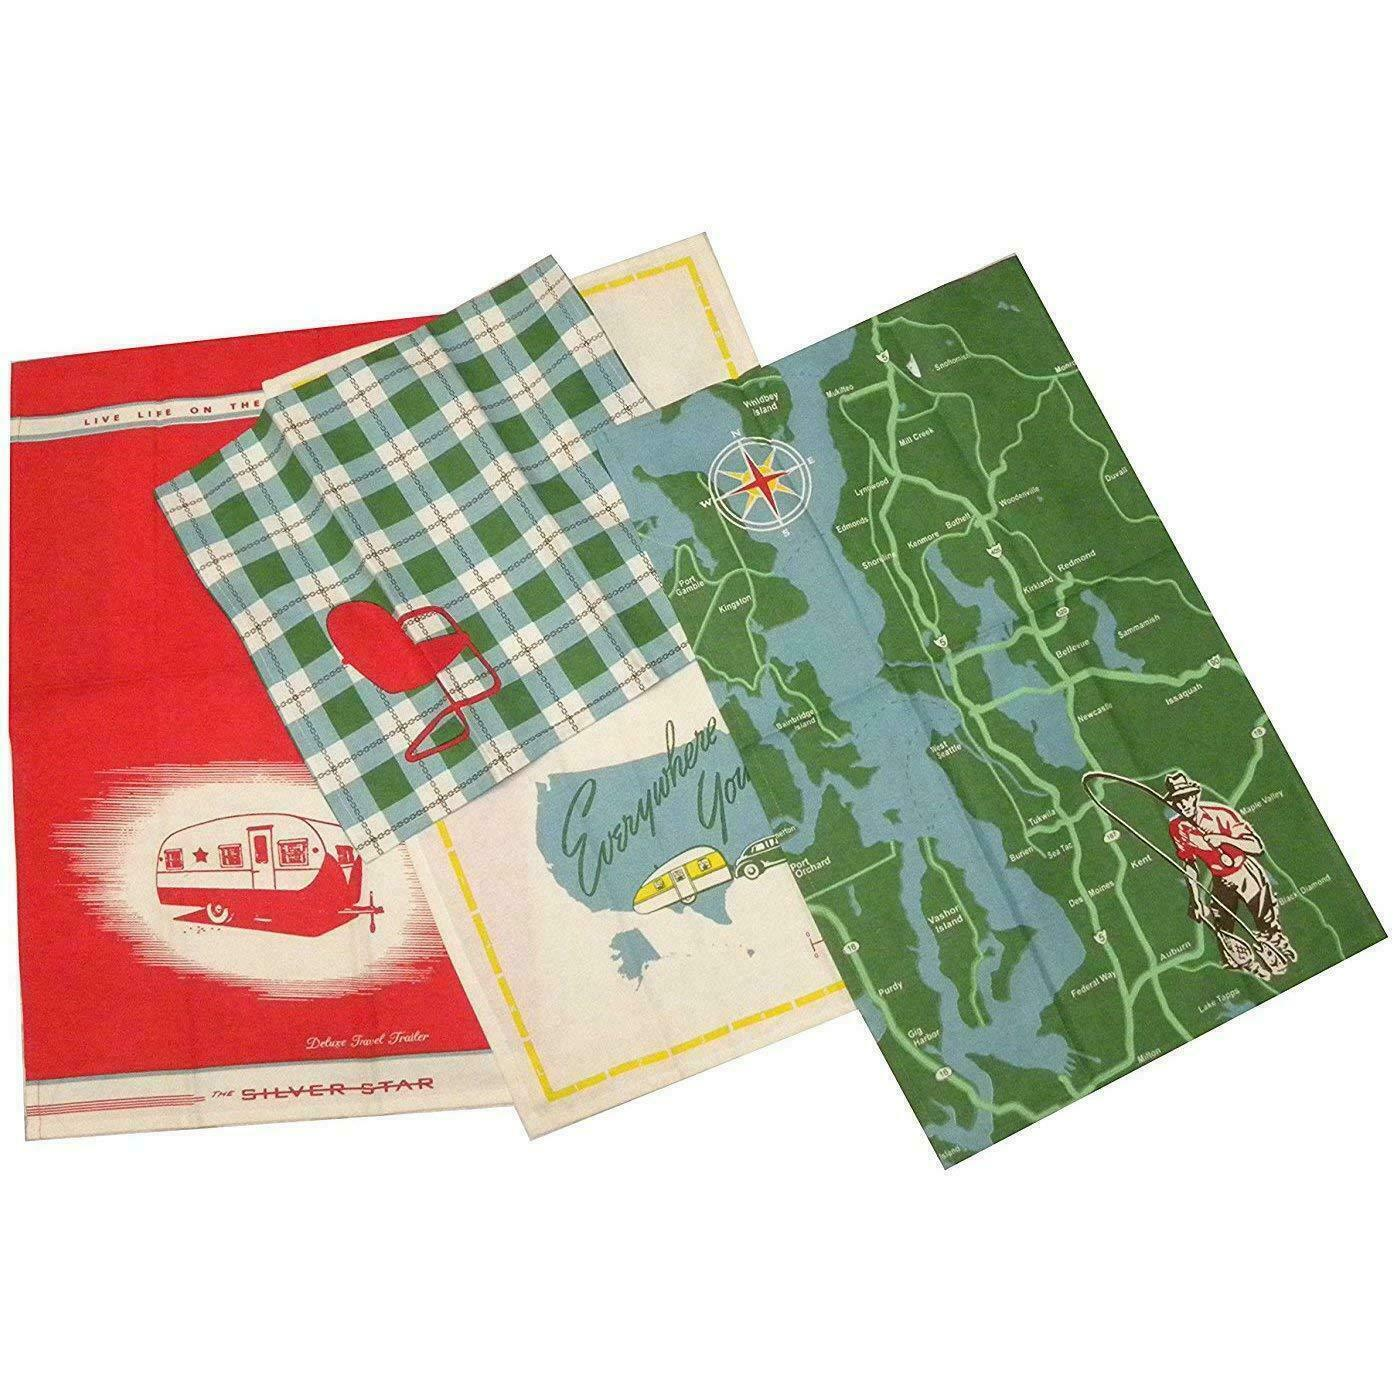 "Vintage/Retro Style Camping Tea Towel Set / Moda ""Great Outd"